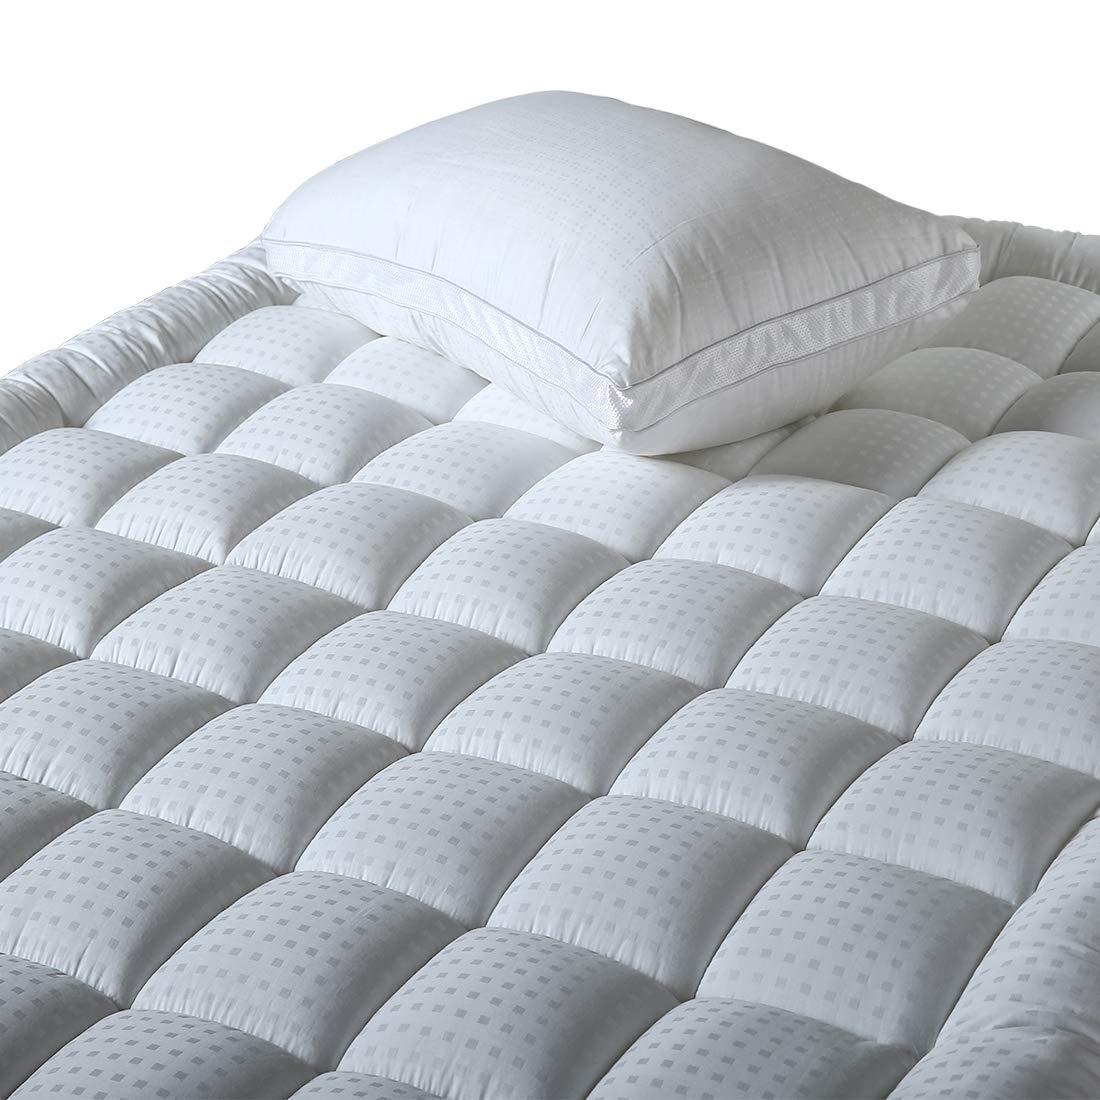 Mattress Pad Cover Twin Size Pillowtop 300TC Down Alternative Mattress Topper